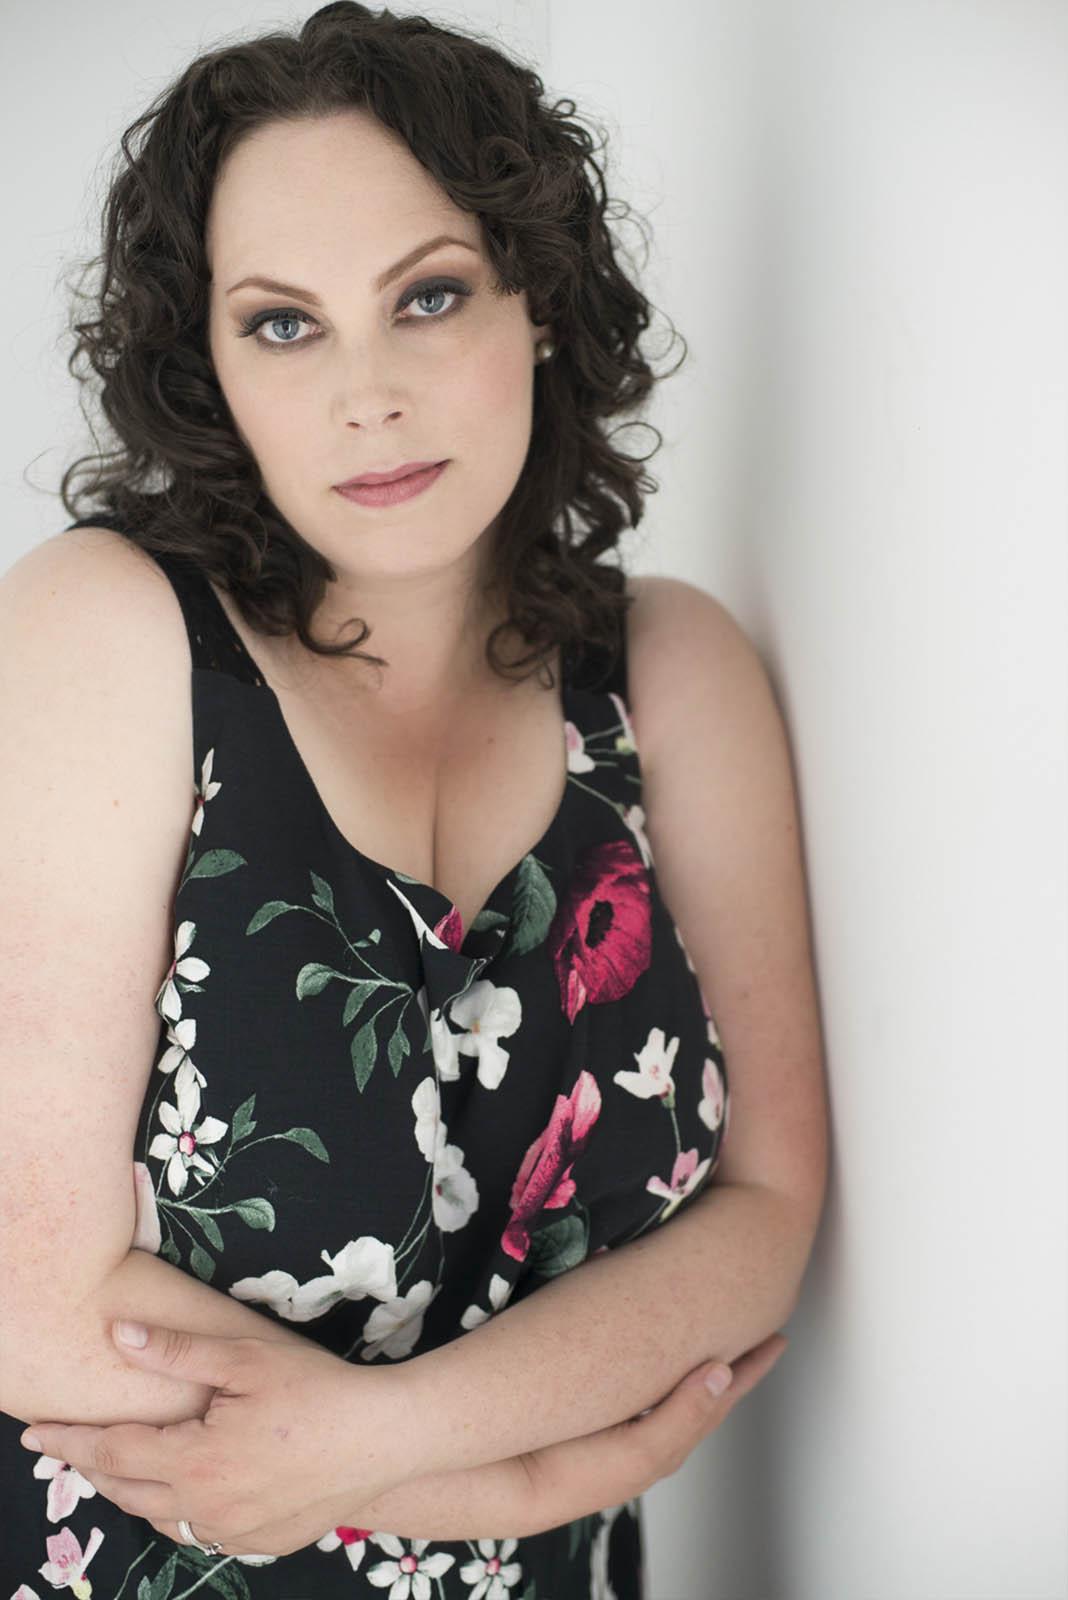 Chelsey Luren Portraits - Eating Disorder Recovery Photoshoot   Nicole Testimonial4.jpg